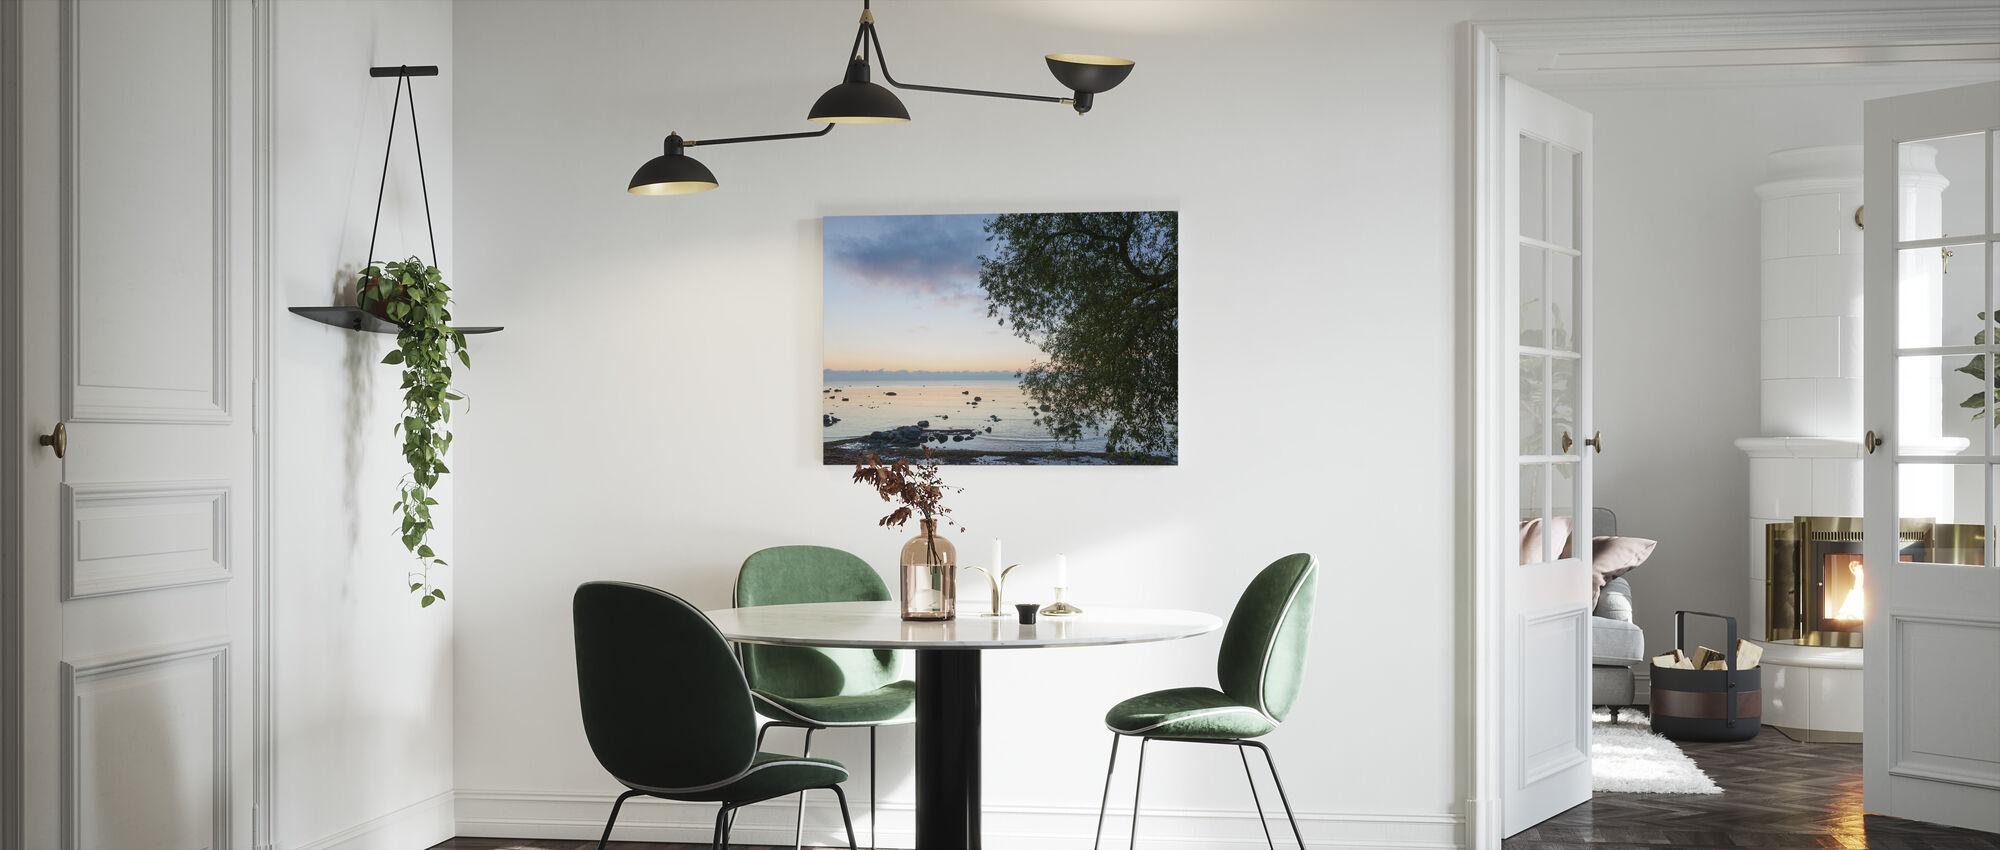 Gotland Sea Landscape at Sunset - Canvas print - Kitchen